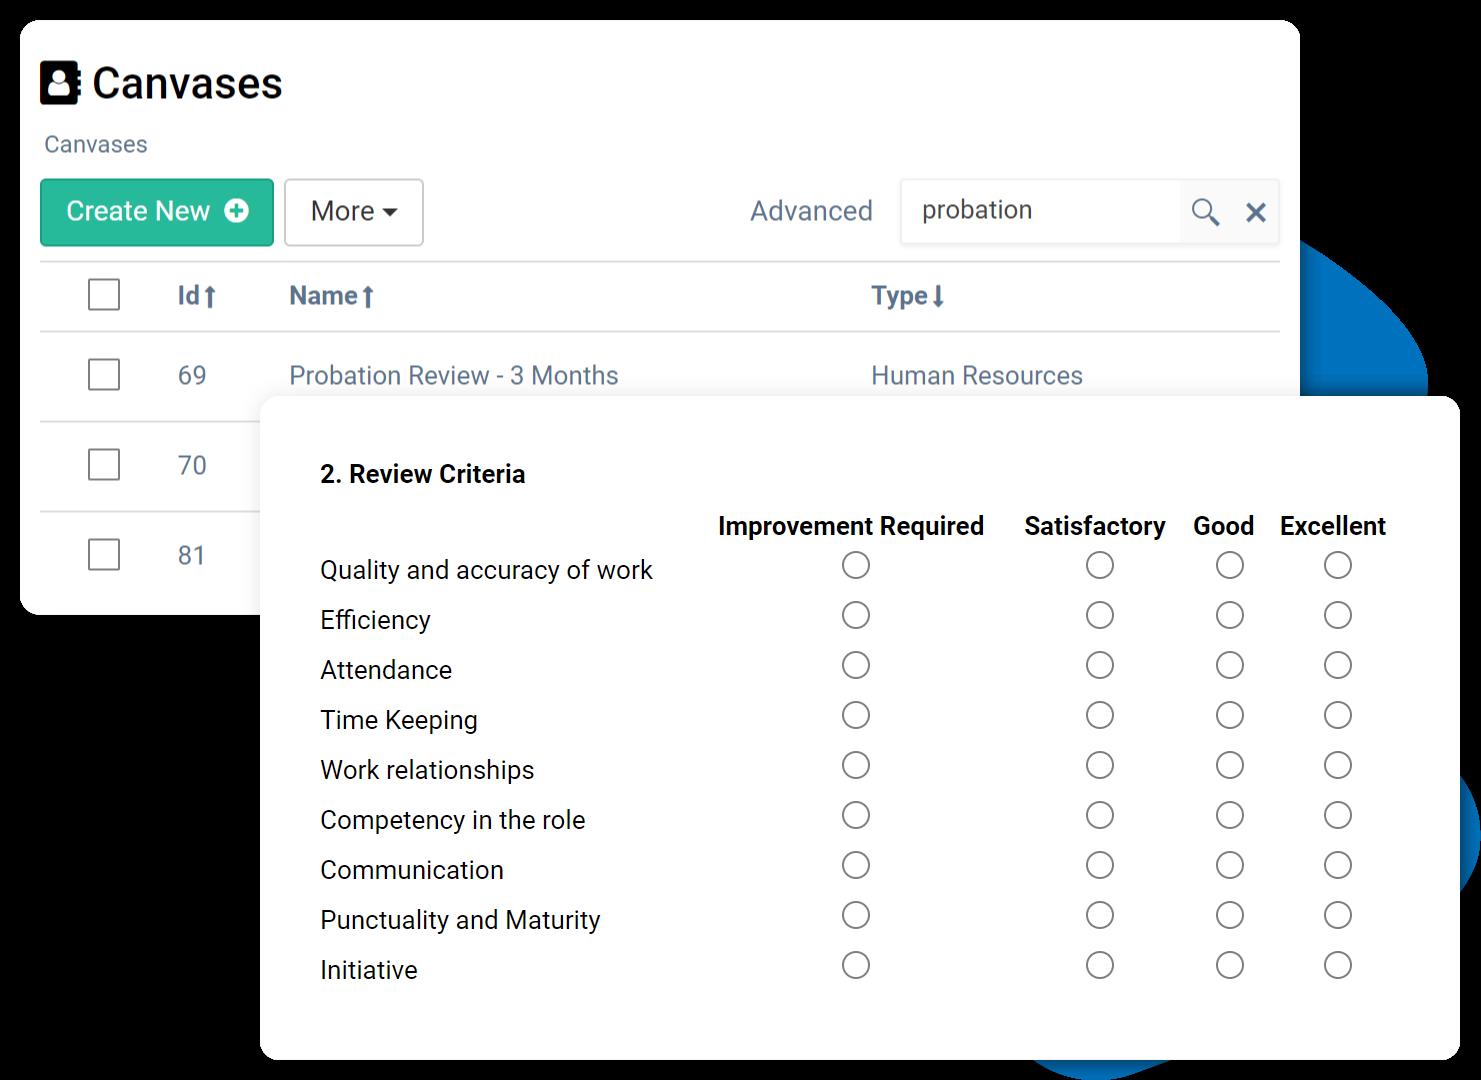 Employee Survey Software